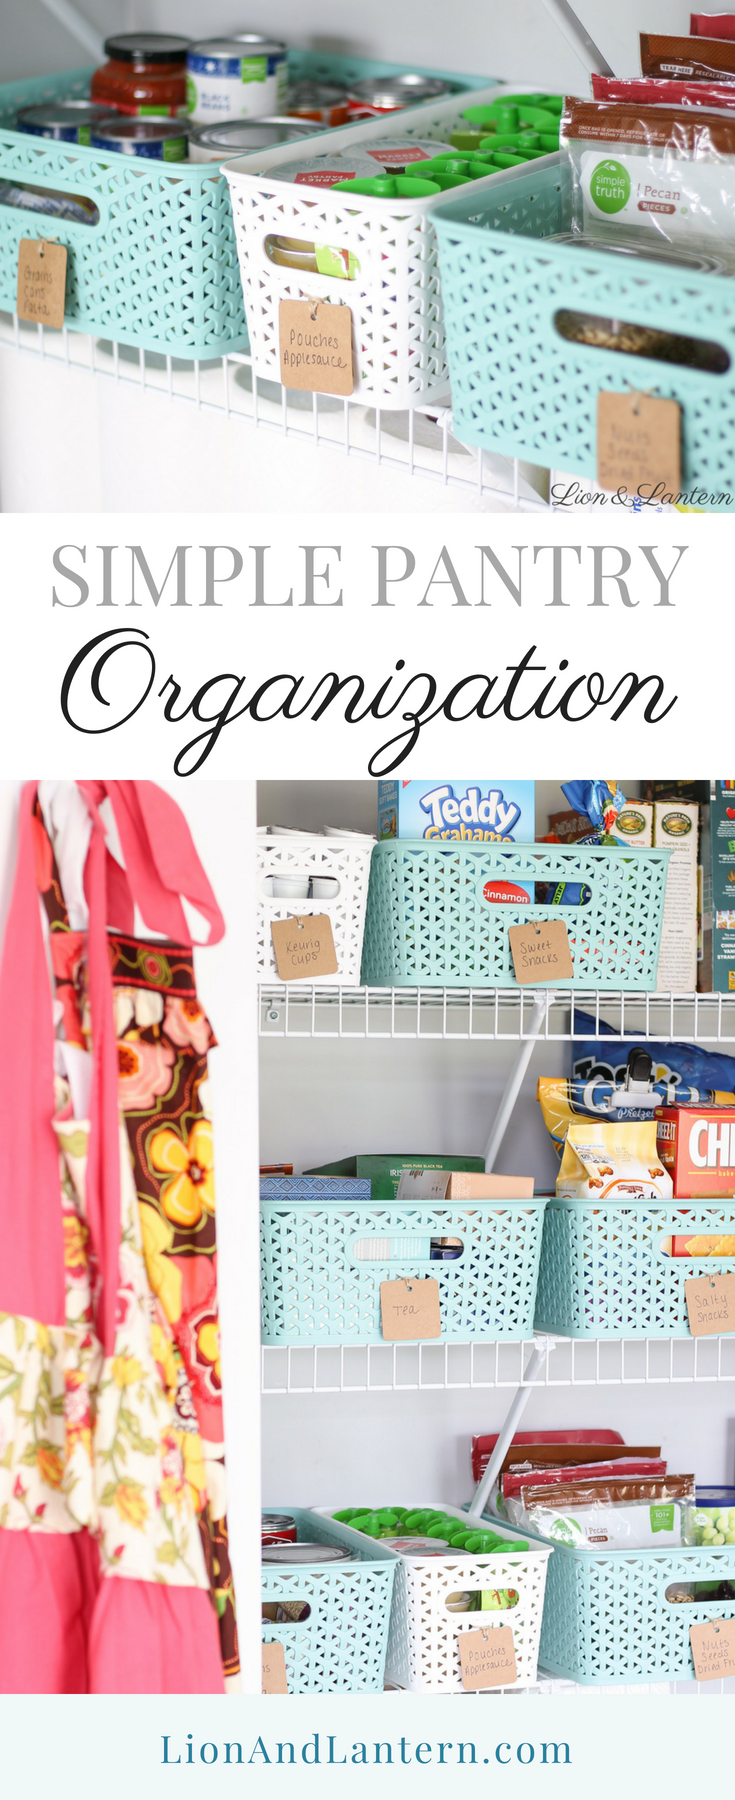 Simple Pantry Organization at LionAndLantern.com | pantry bins, budget organizing, spark joy, Target y weave baskets, food organization